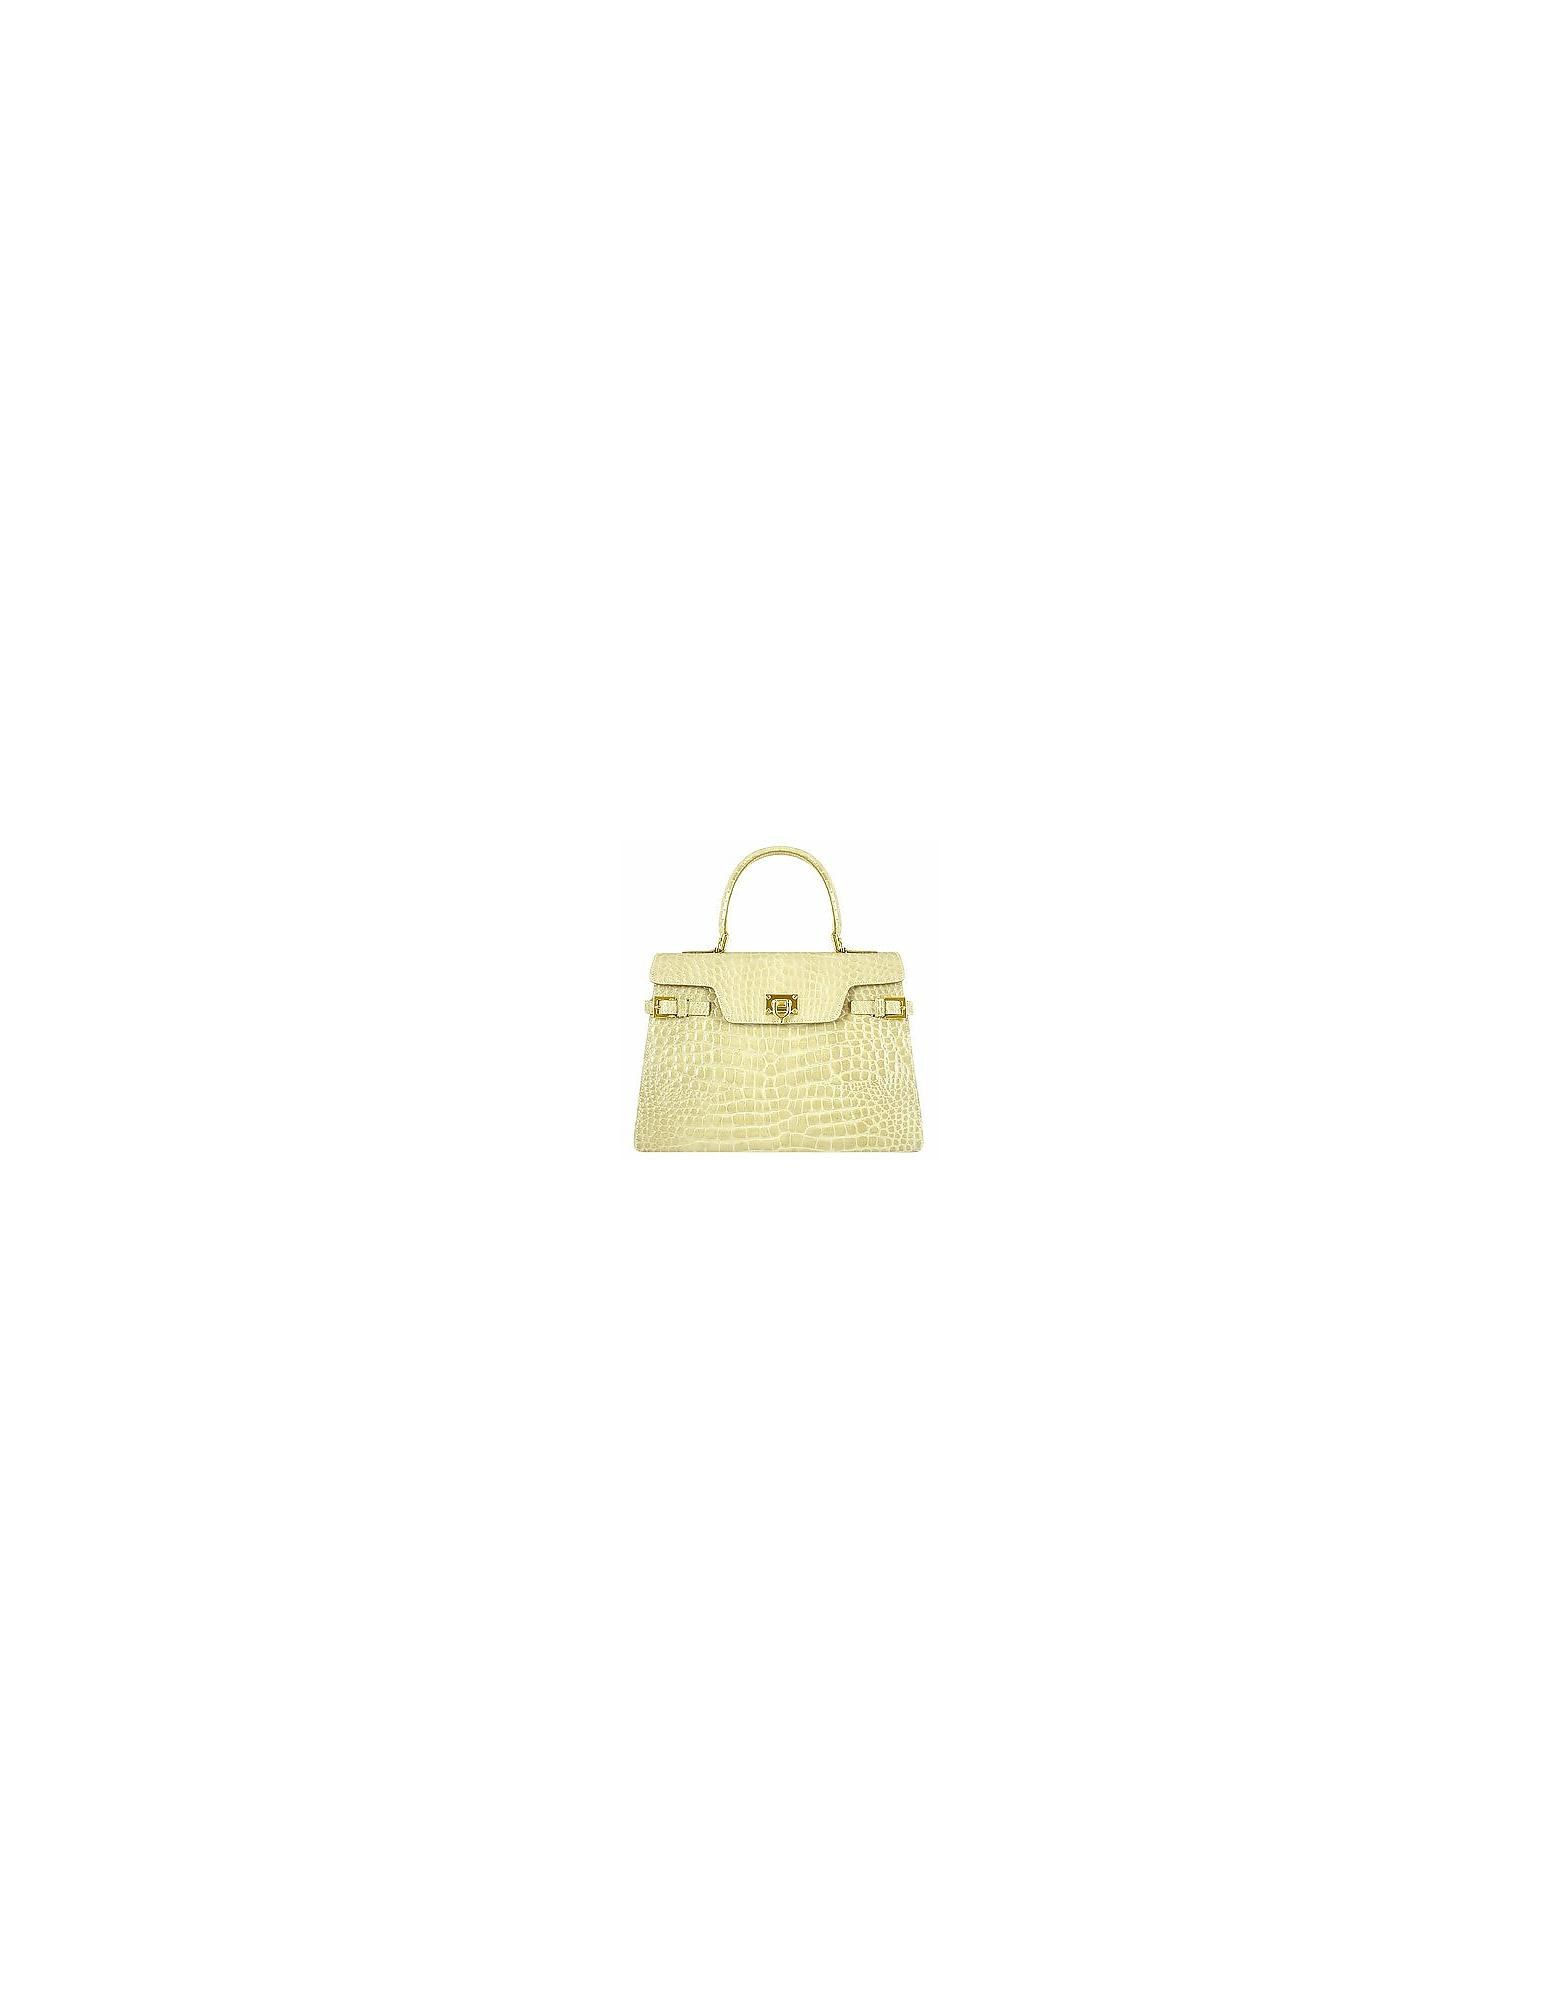 b6ed82cd6001c Fontanelli. Women s Shiny Sand Croco-style Leather Handbag